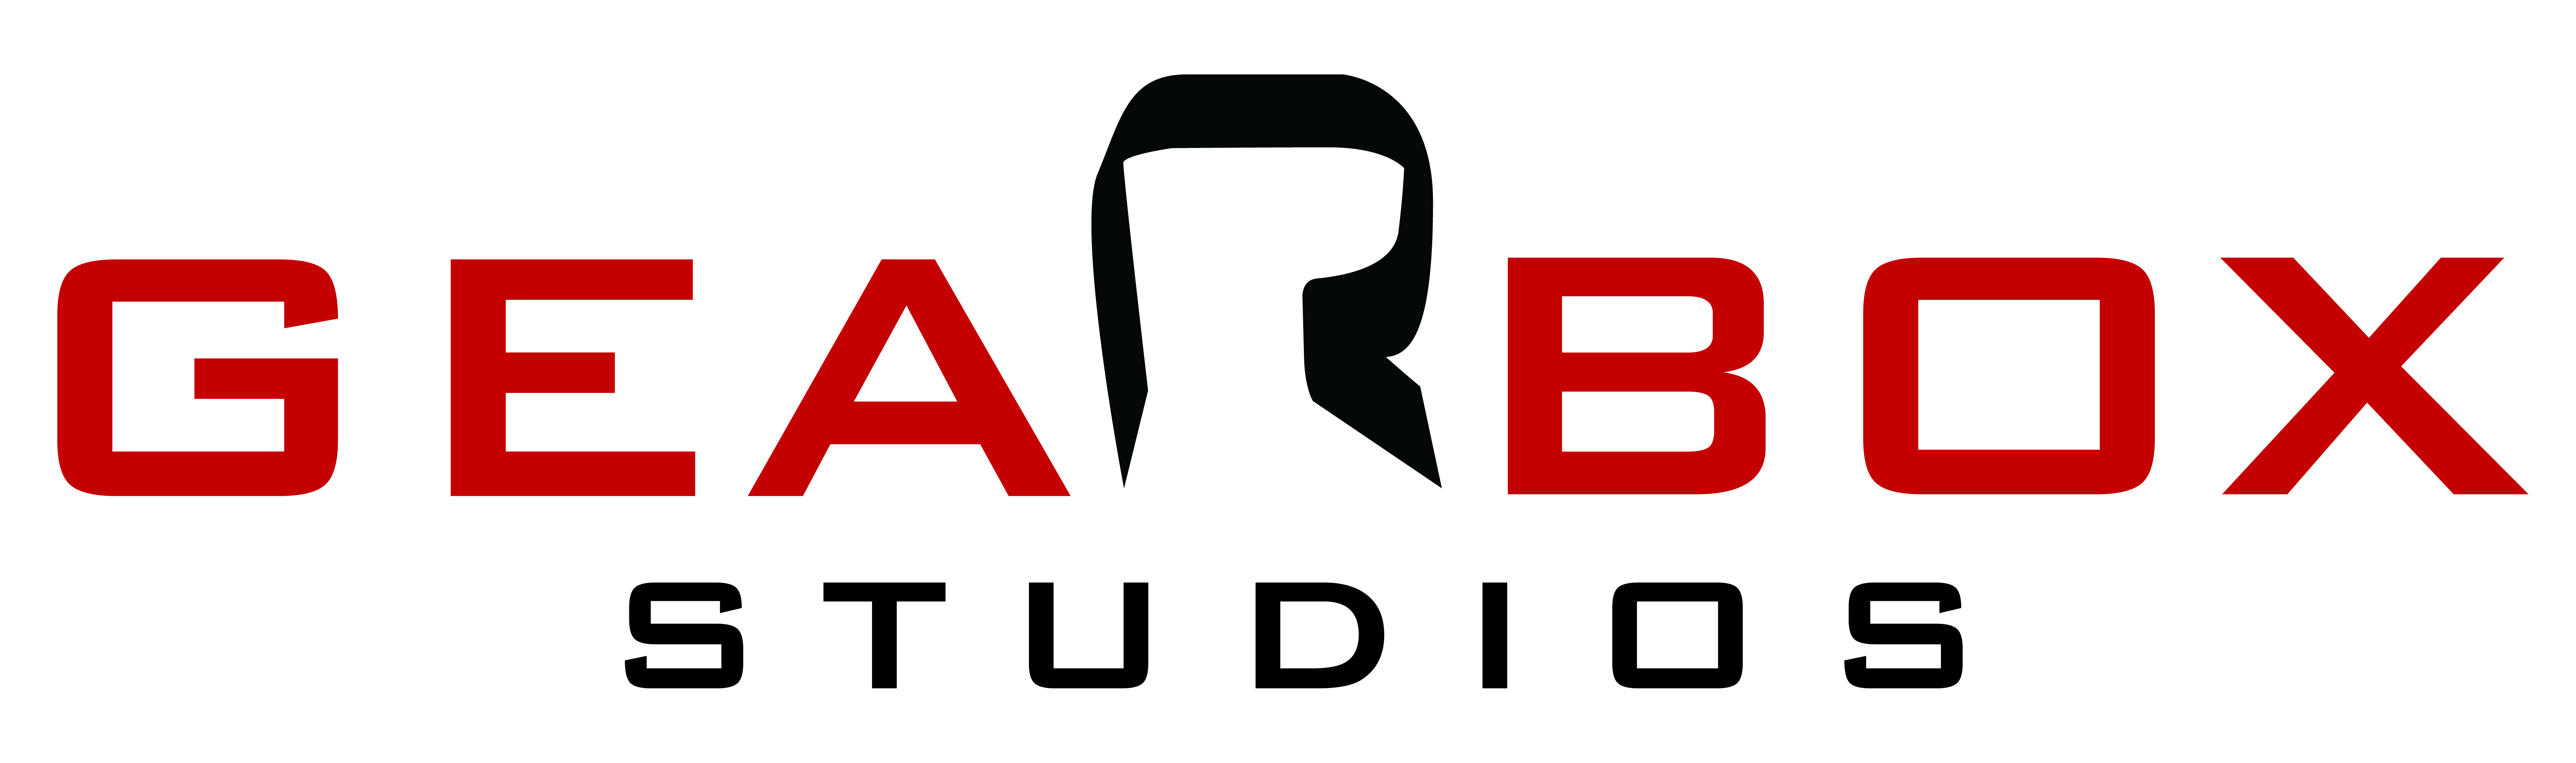 GBS_logo_M-01